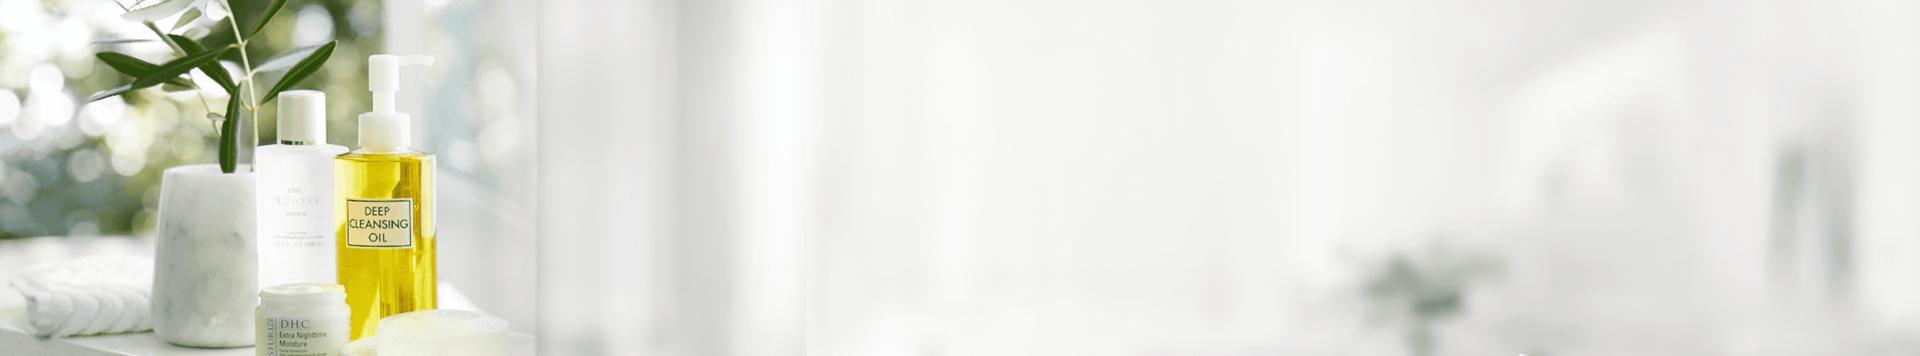 DHC Skincare products banner for Japanese 4 step regimen